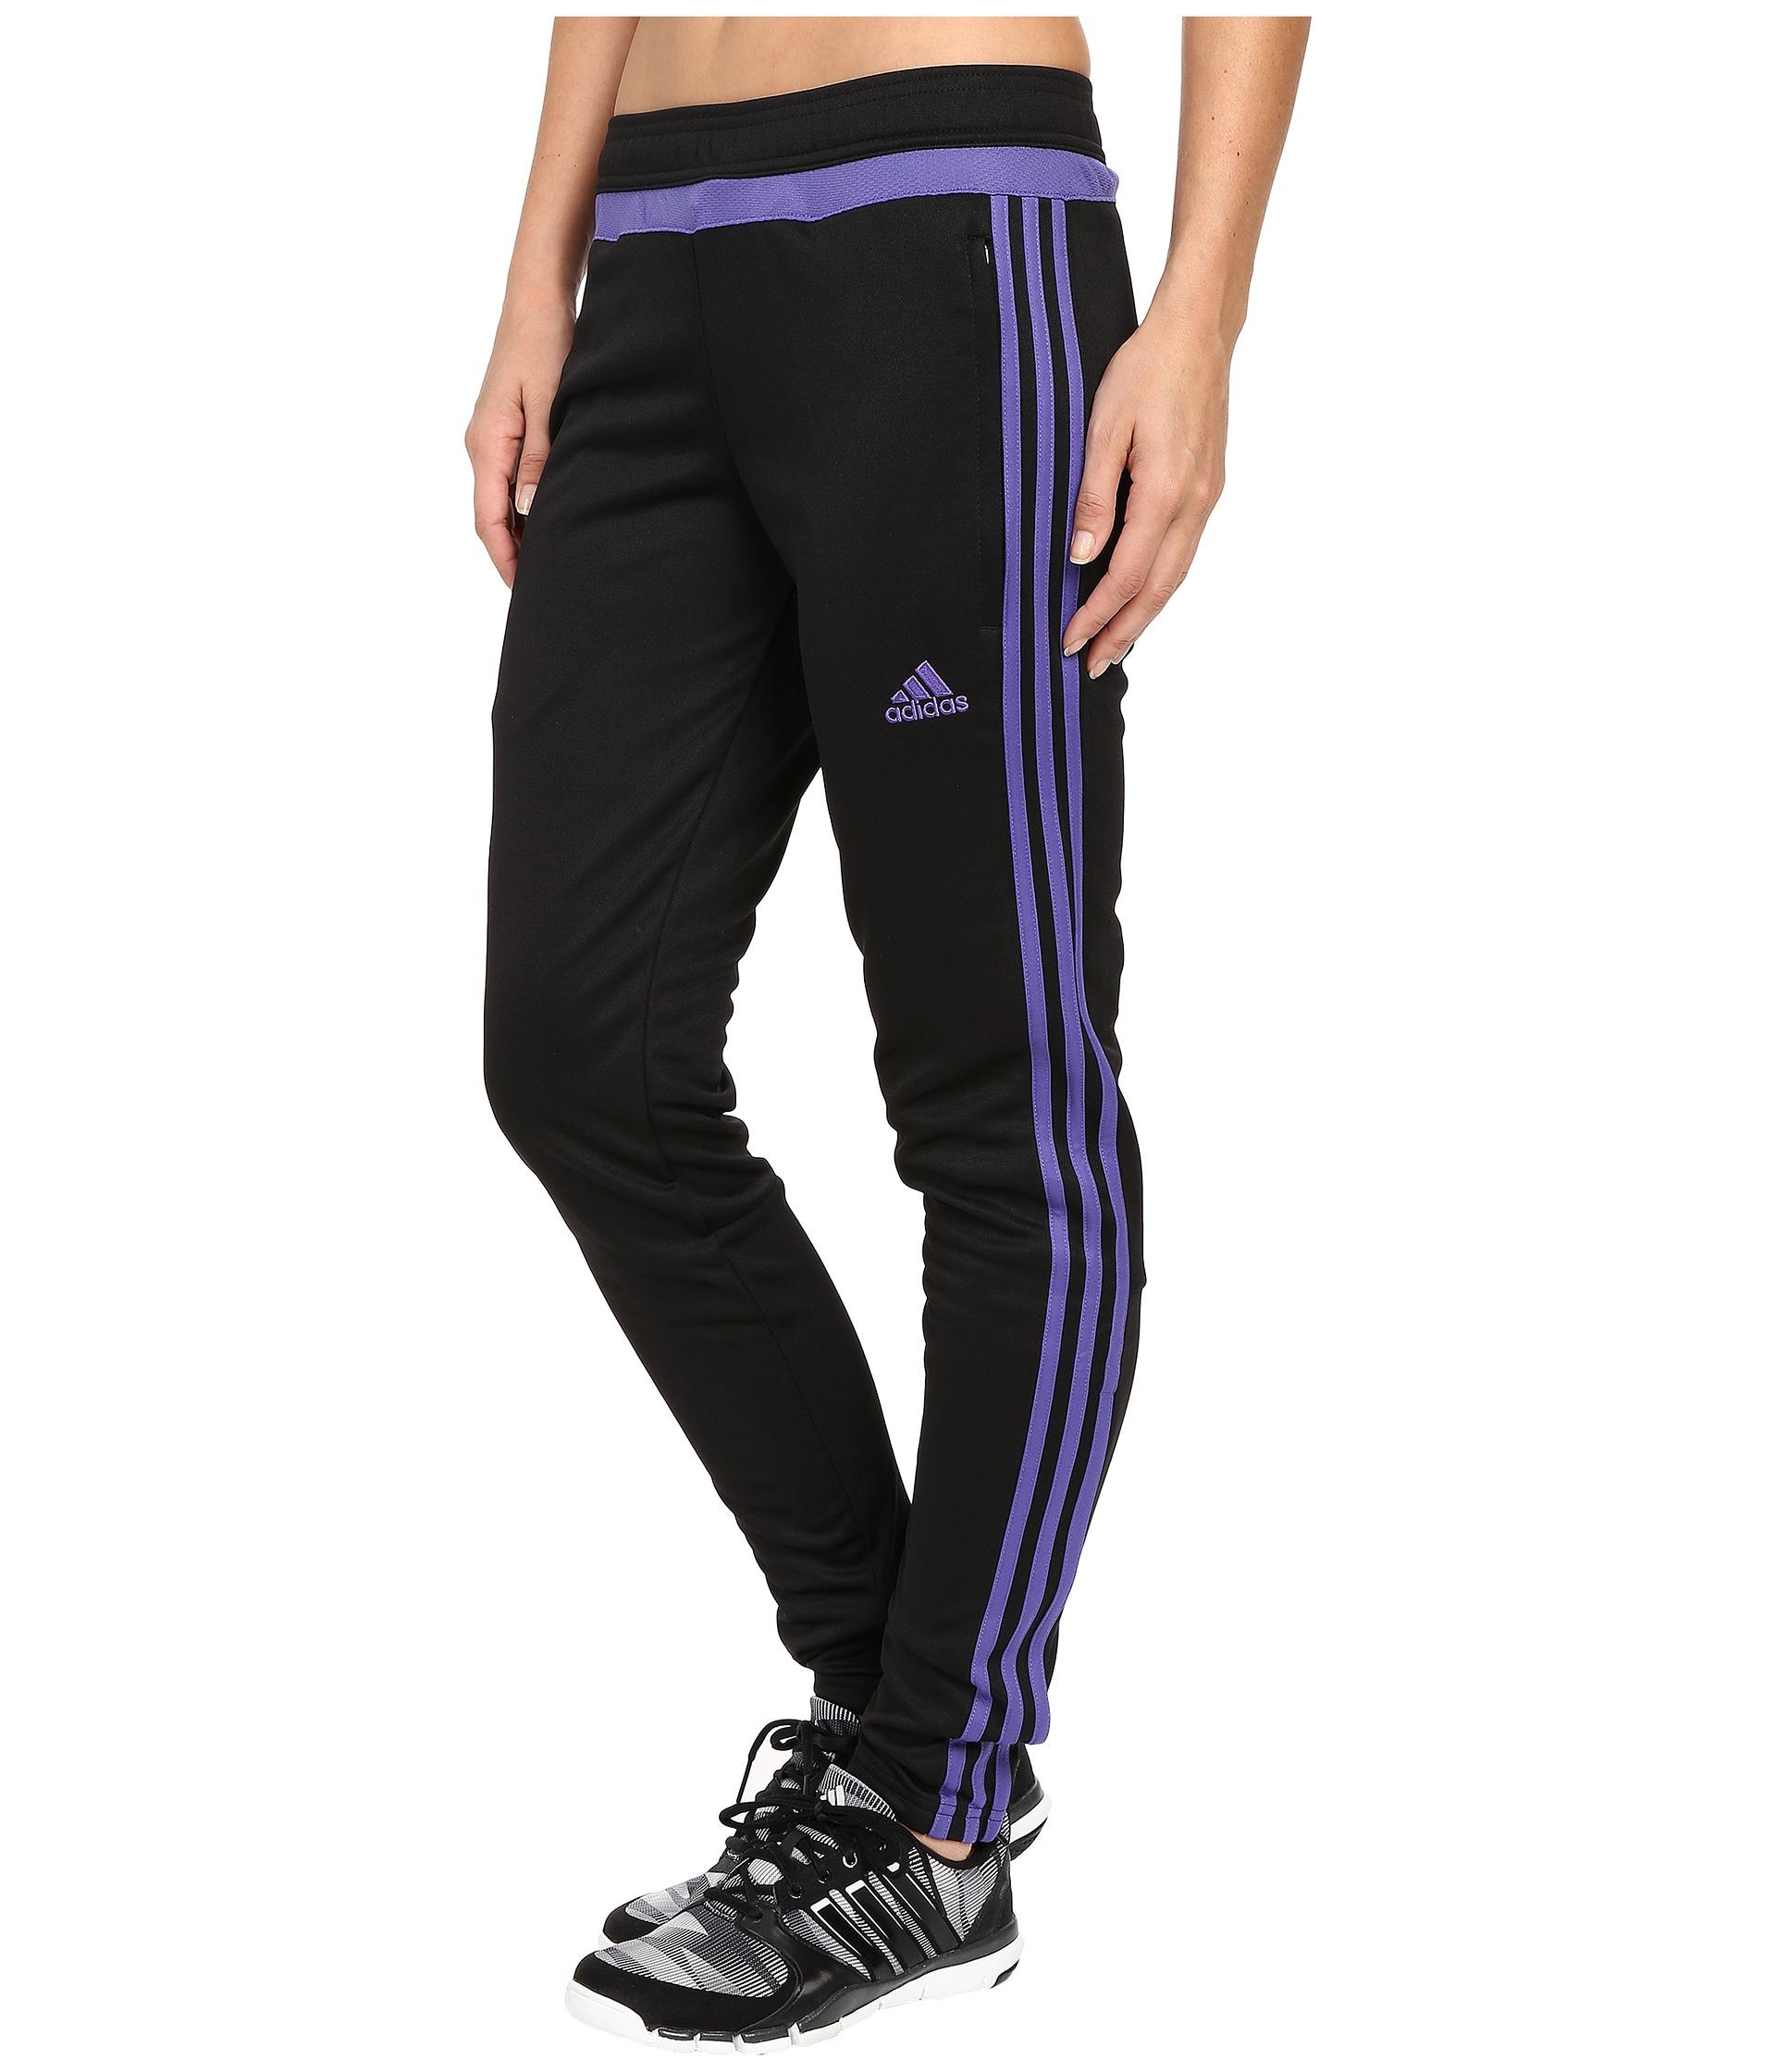 Flair Brand Clothing